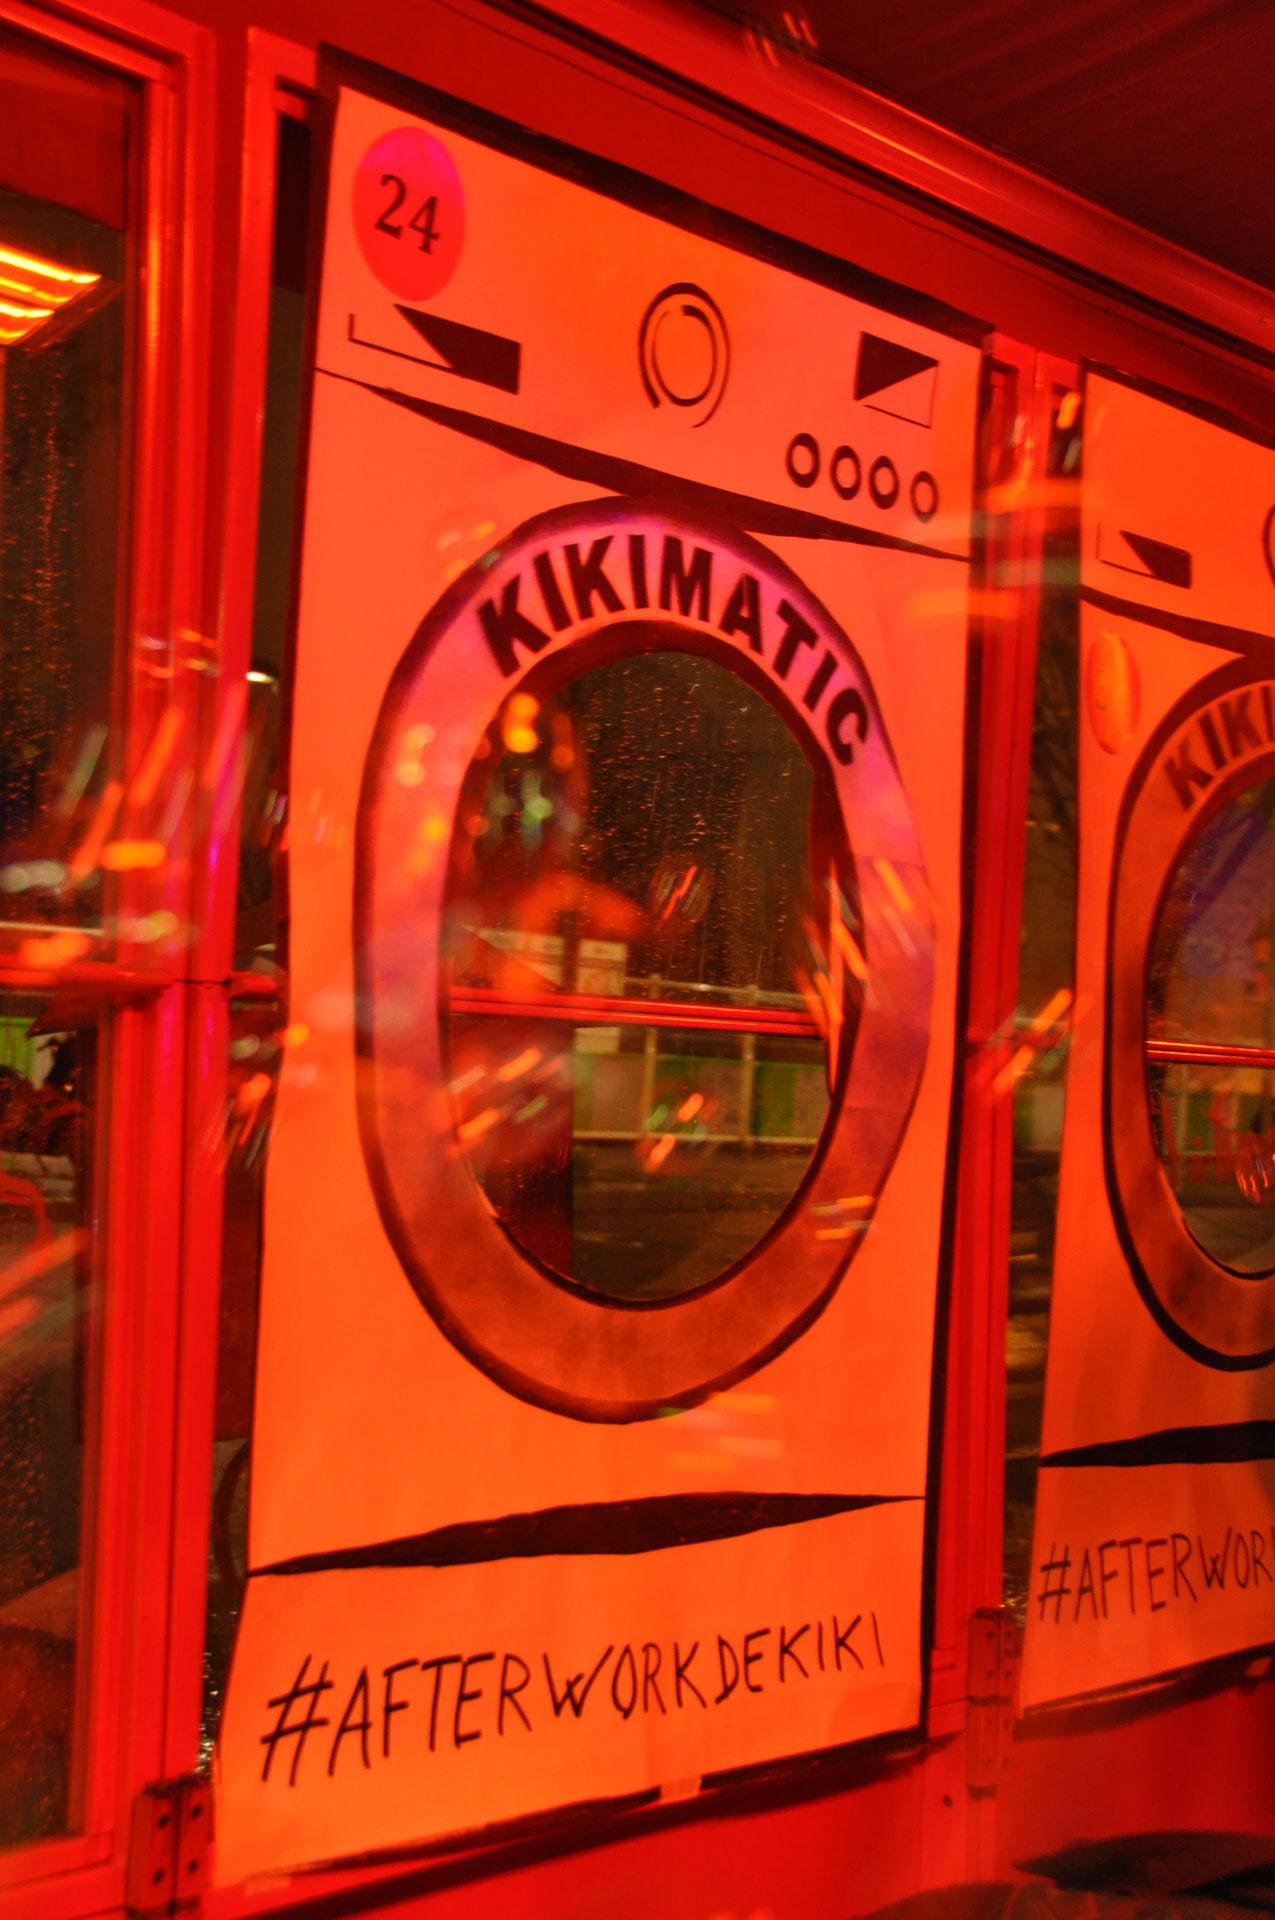 kiki lavomatic,afterwork de Kiki,afterwork Paris